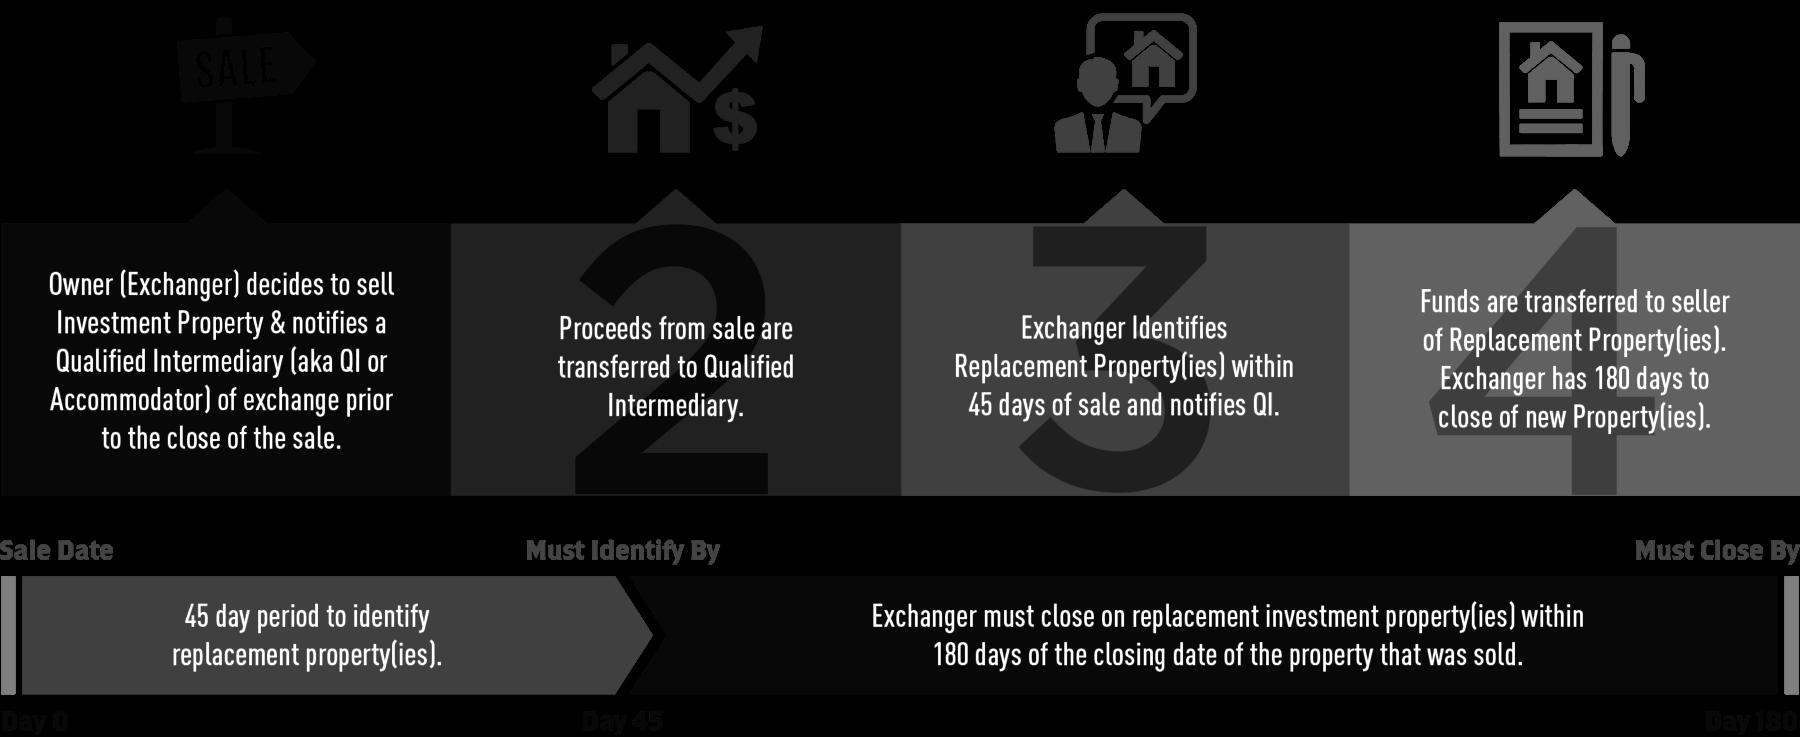 1031 Exchange Rules - налоговый обмен